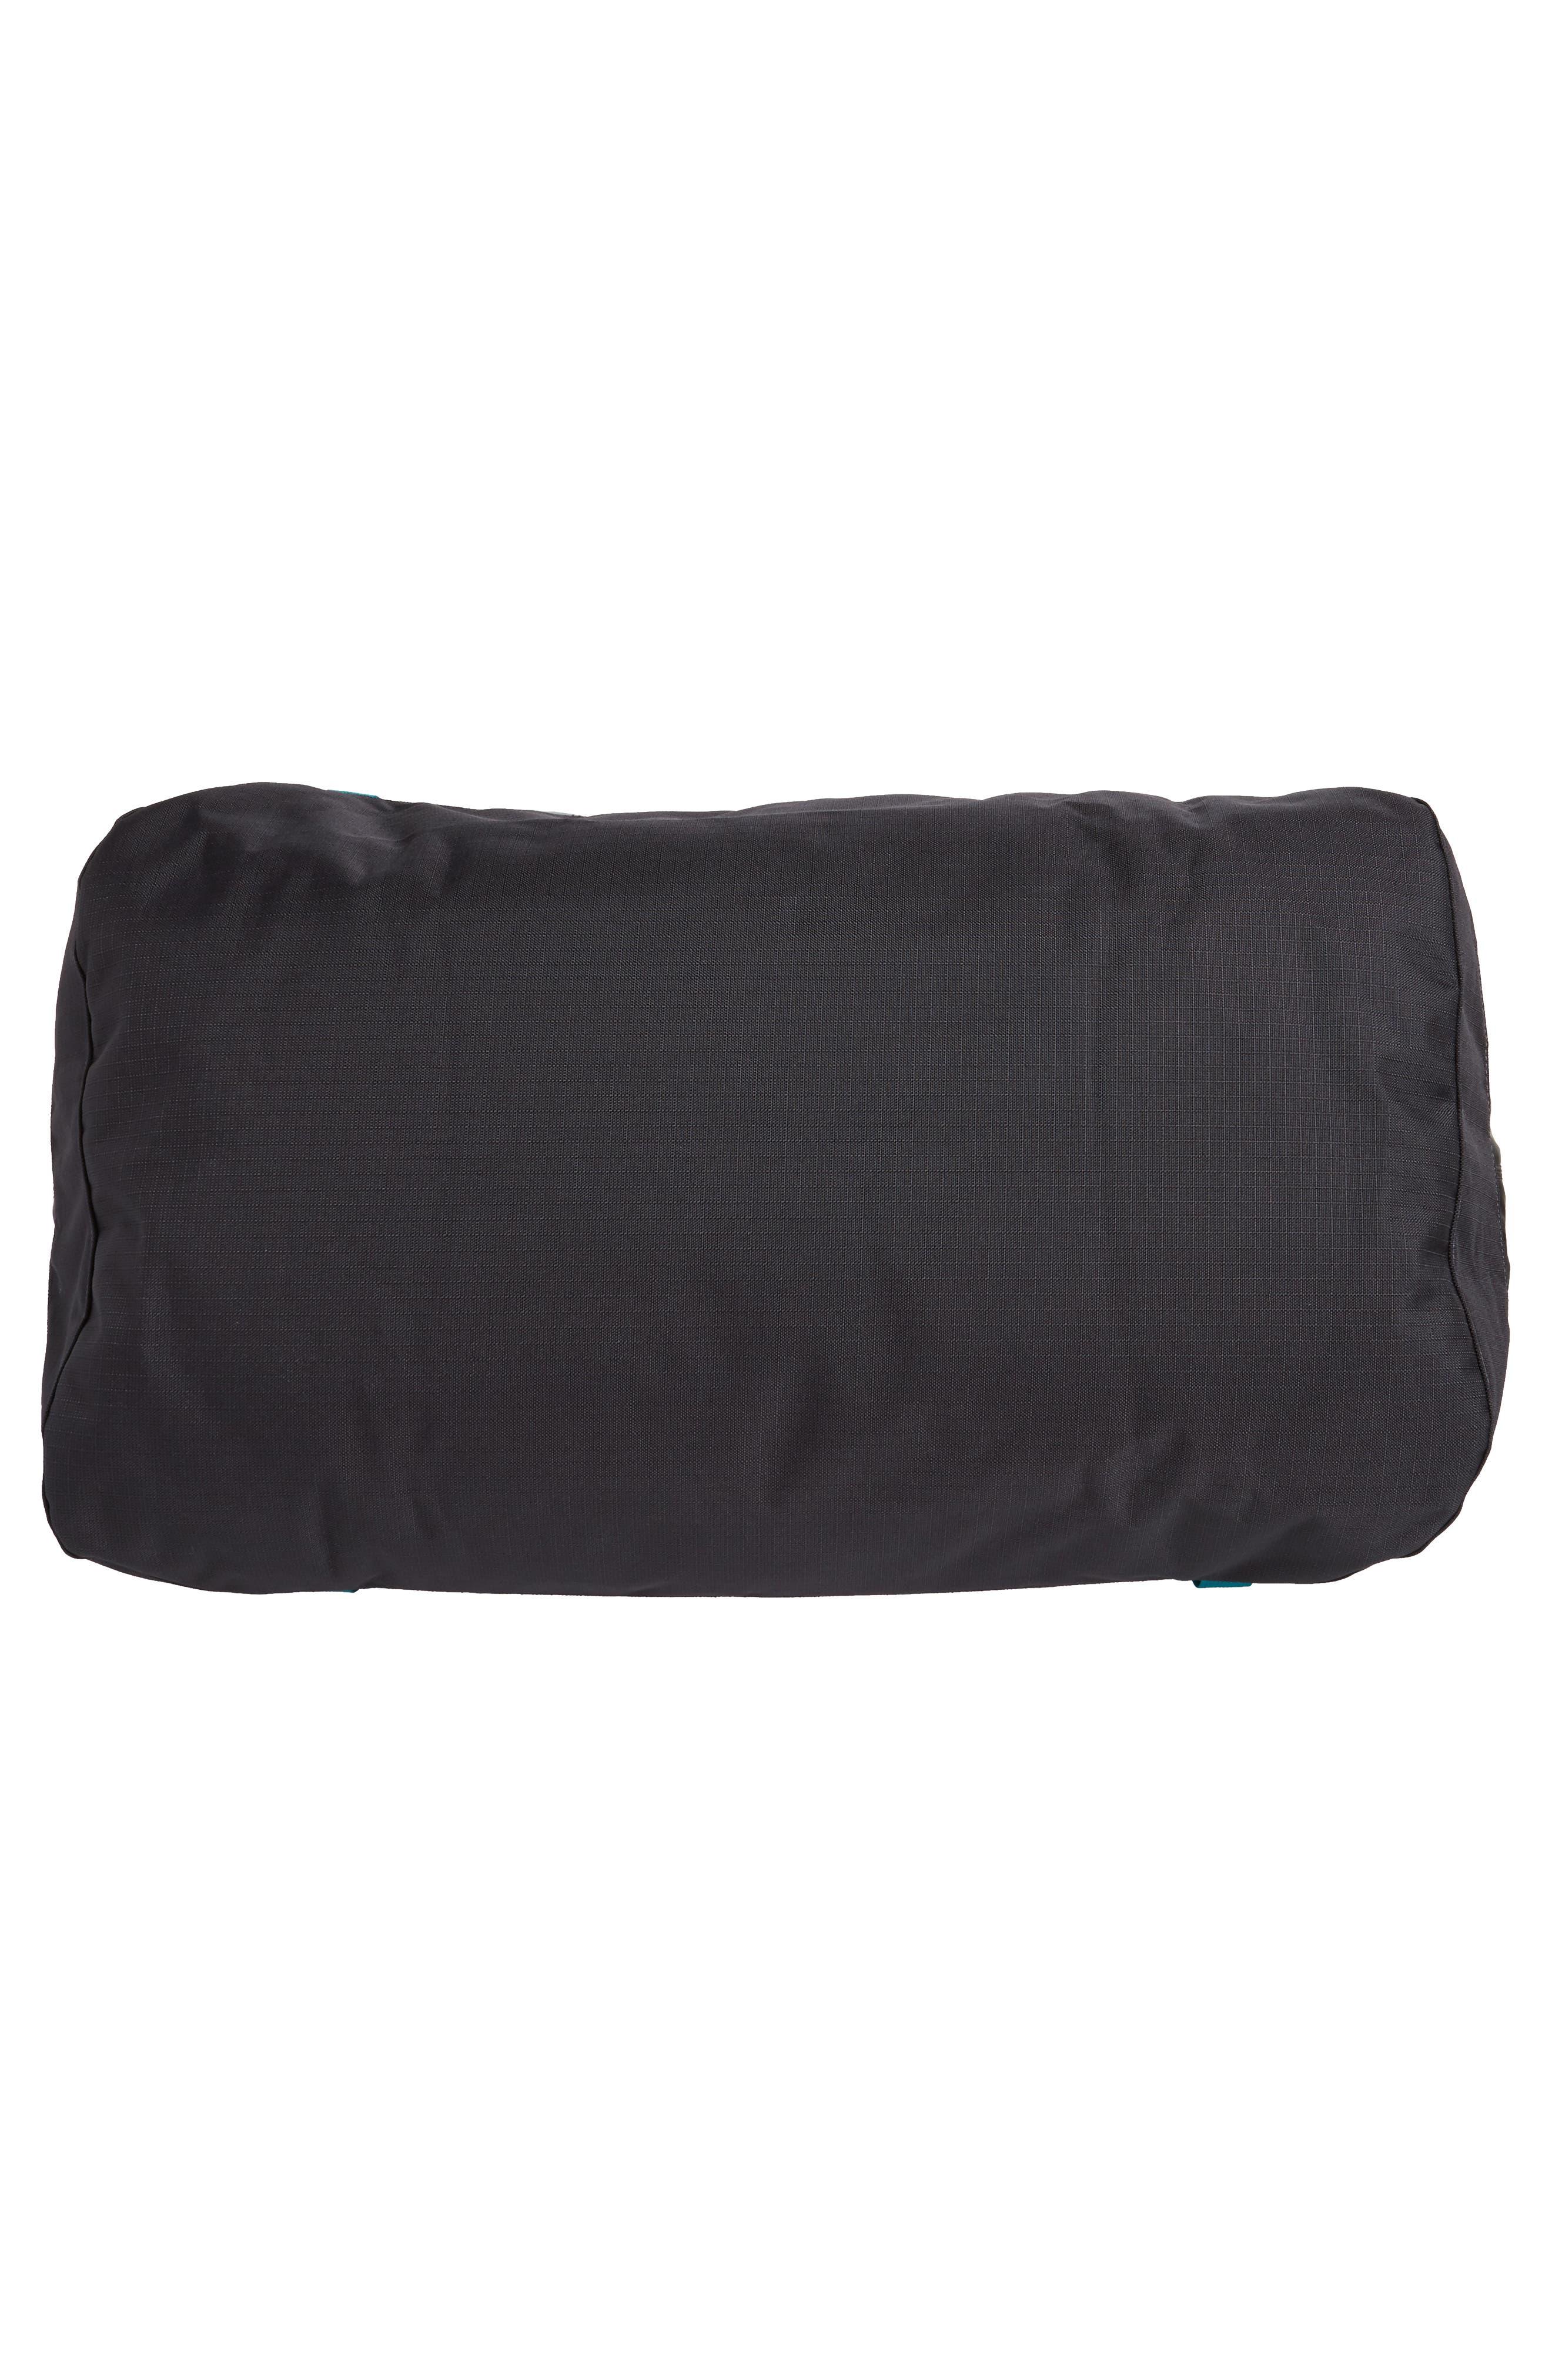 'Black Hole<sup>™</sup>' 90L Duffel Bag,                             Alternate thumbnail 6, color,                             002